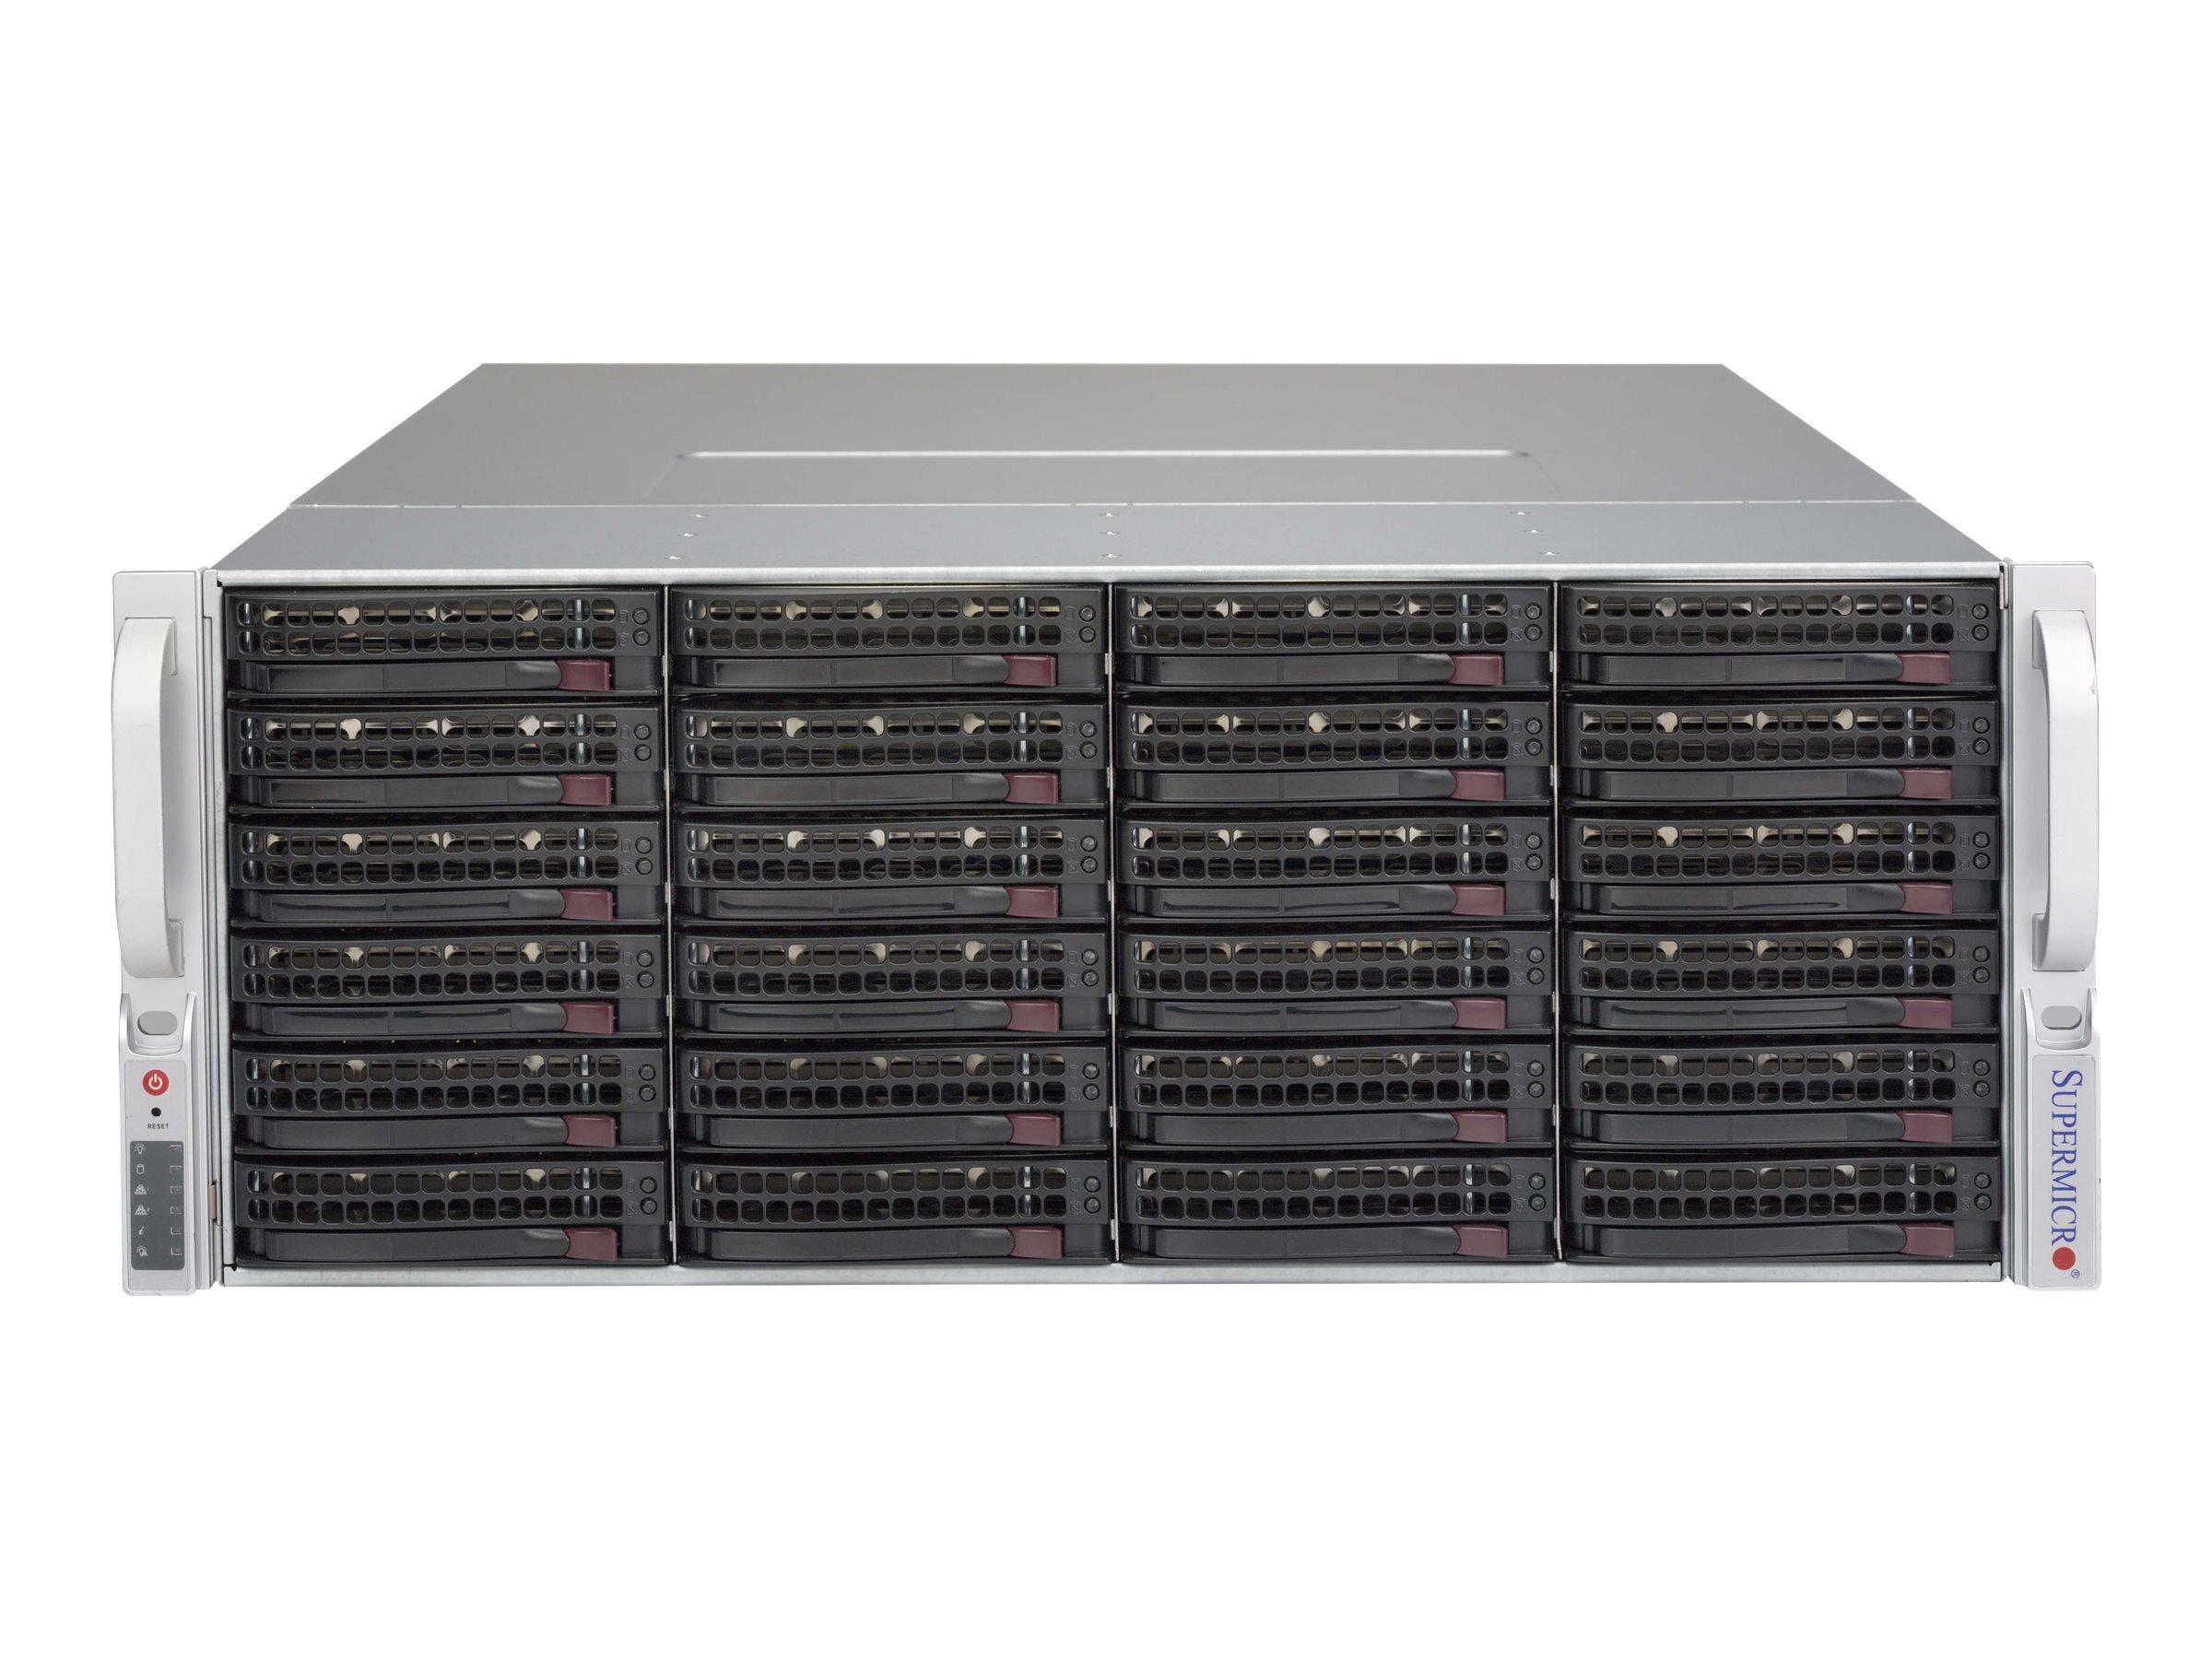 Supermicro SC847 BA-R1K28LPB - Rack - einbaufähig - 4U - verbessertes, erweitertes ATX - SATA/SAS